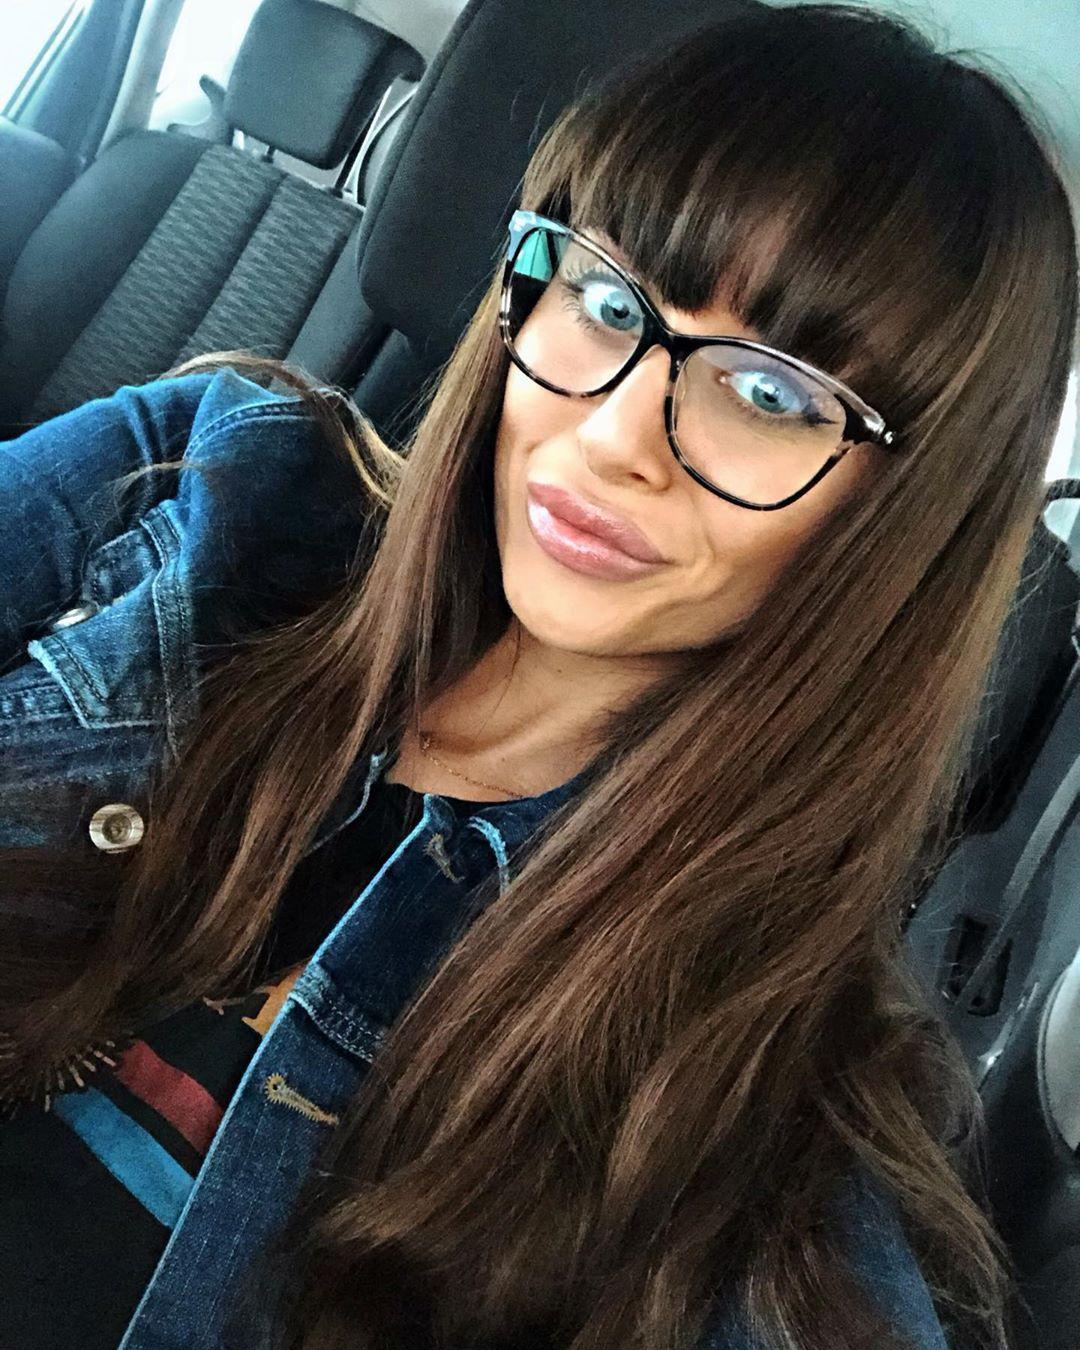 Brejloun Czechgirl Czech Girl Brunette Smile Glasses